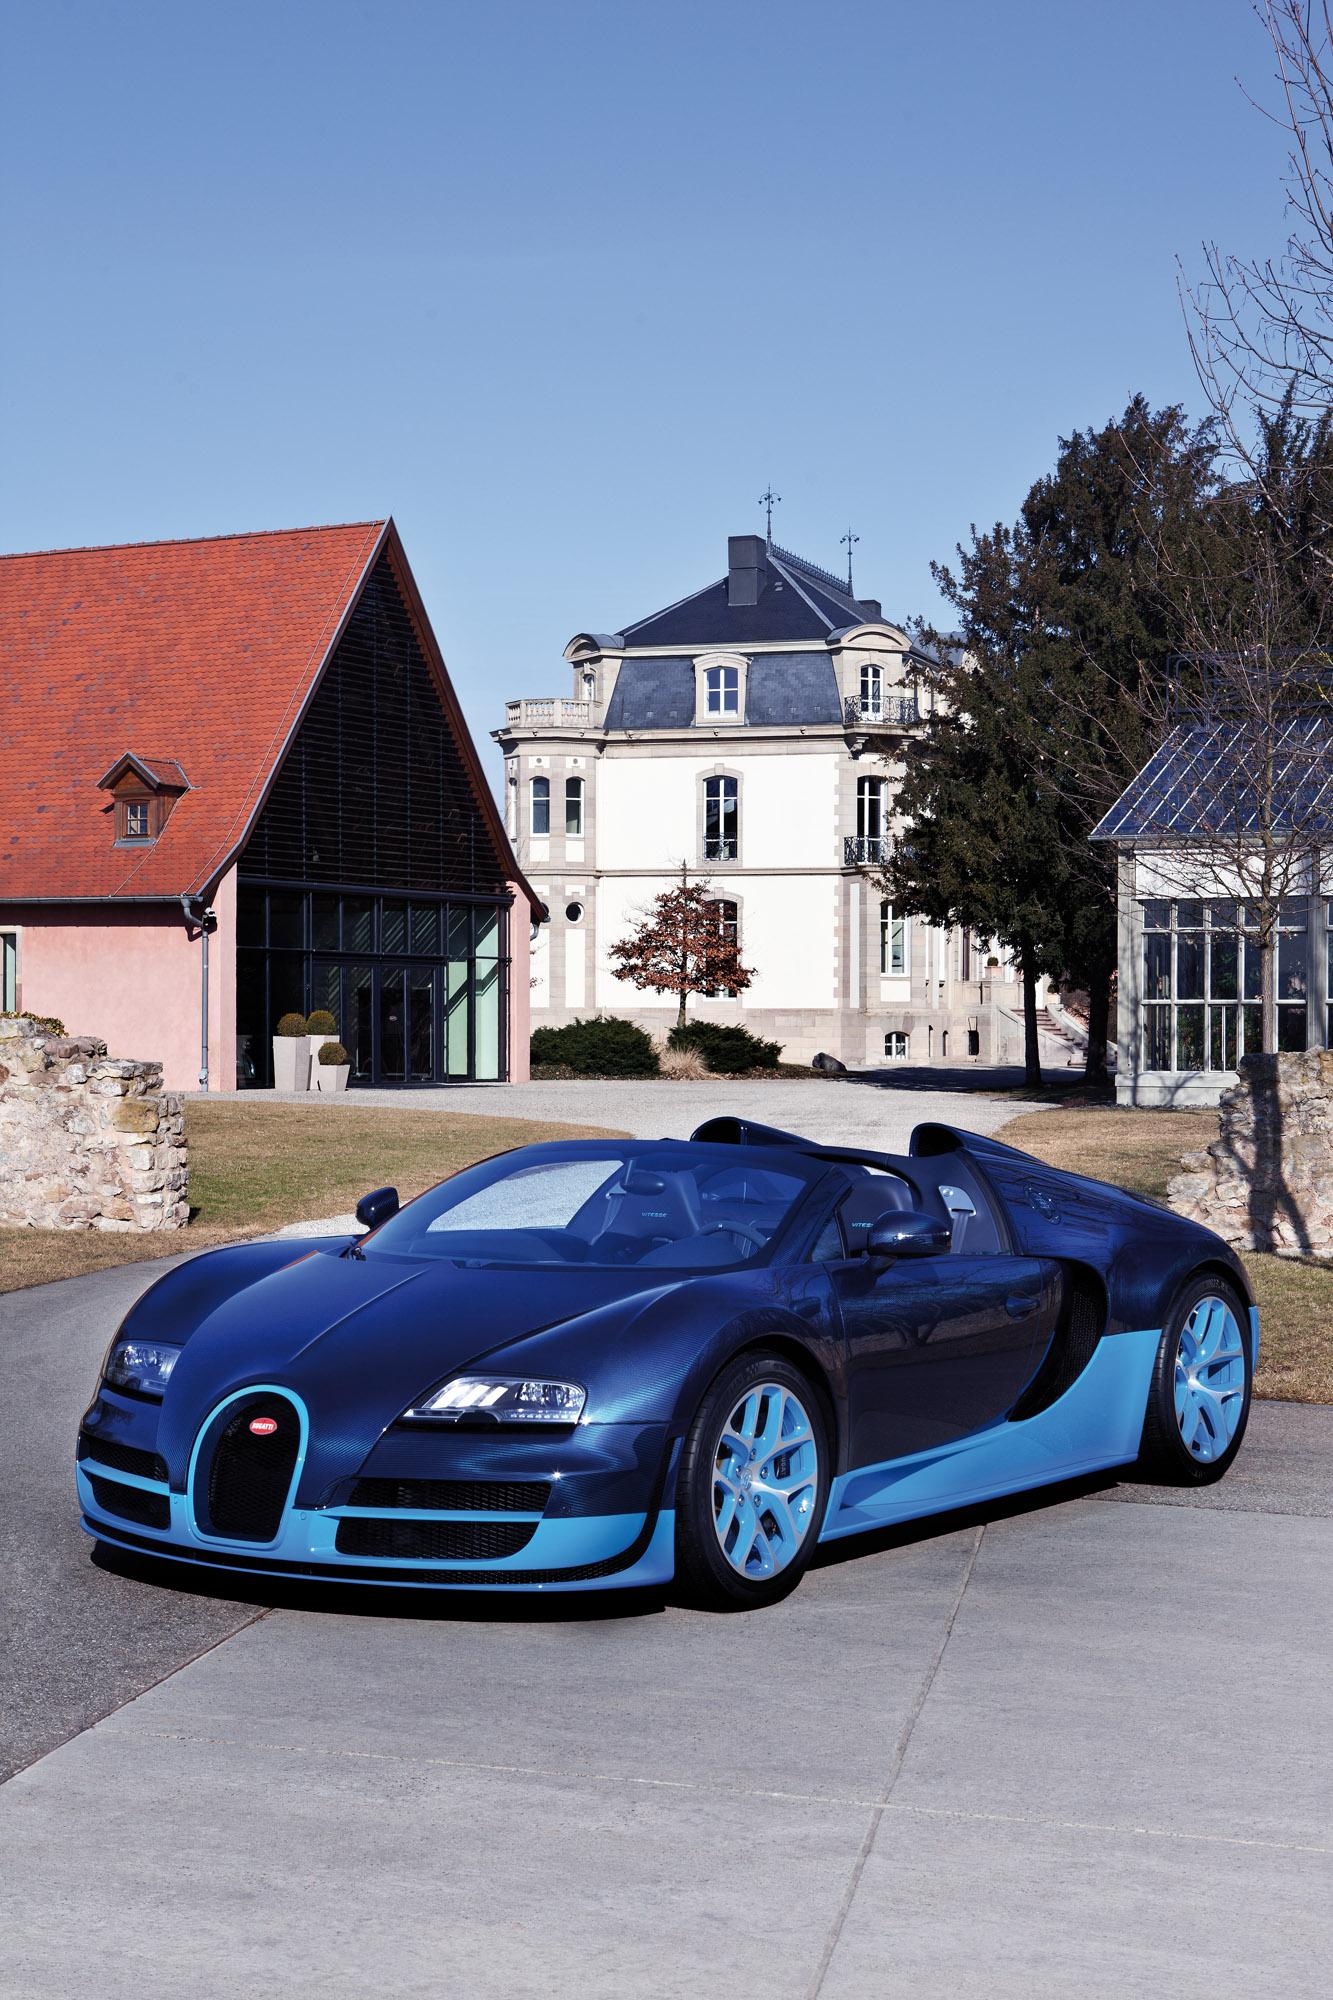 2012-bugatti-veyron-grand-sport-vitesse-blue-carbon-01 Fascinating Bugatti Veyron Grand Sport Vitesse 1/4 Mile Cars Trend